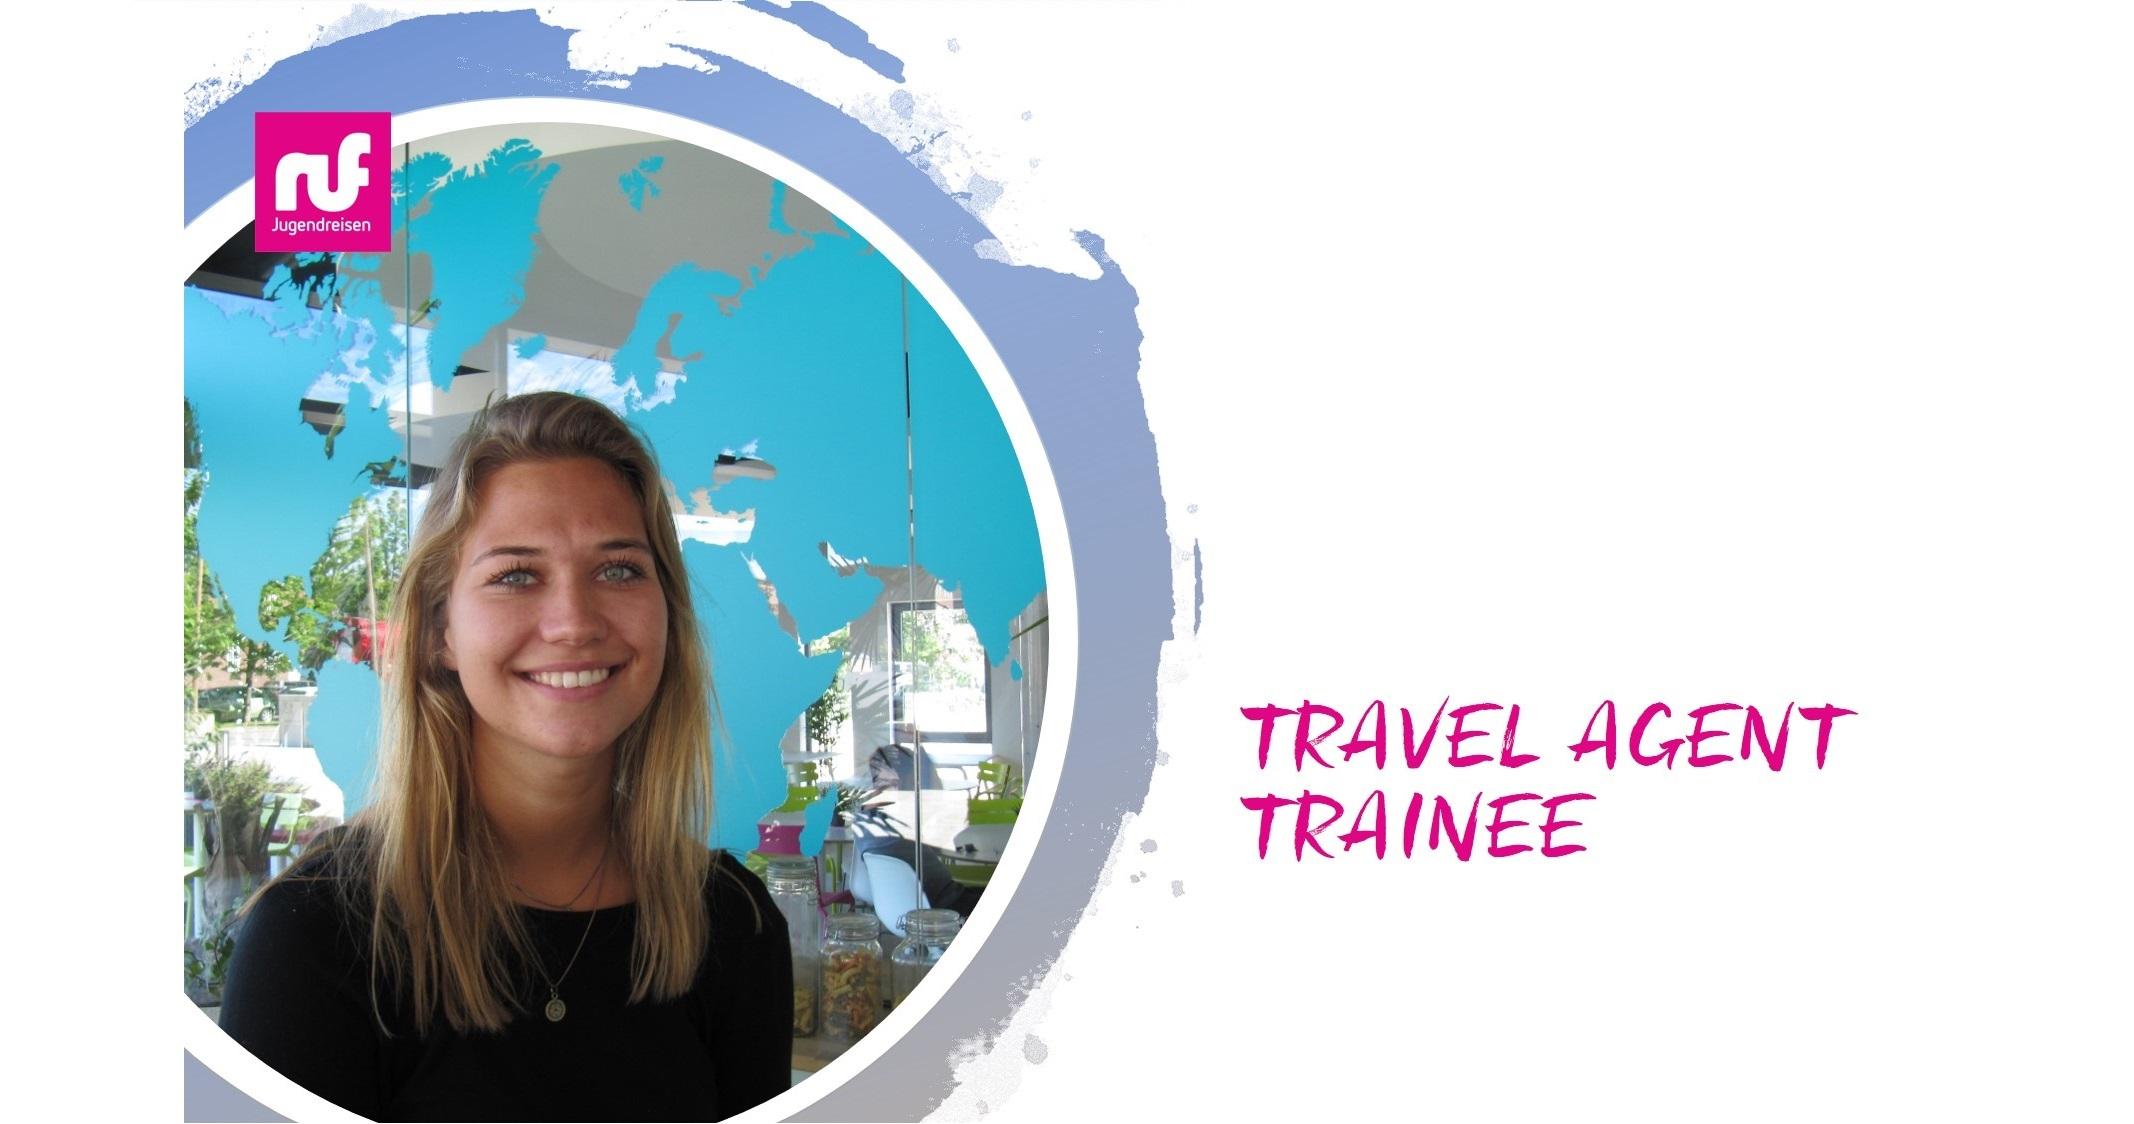 Travel Agent Trainee